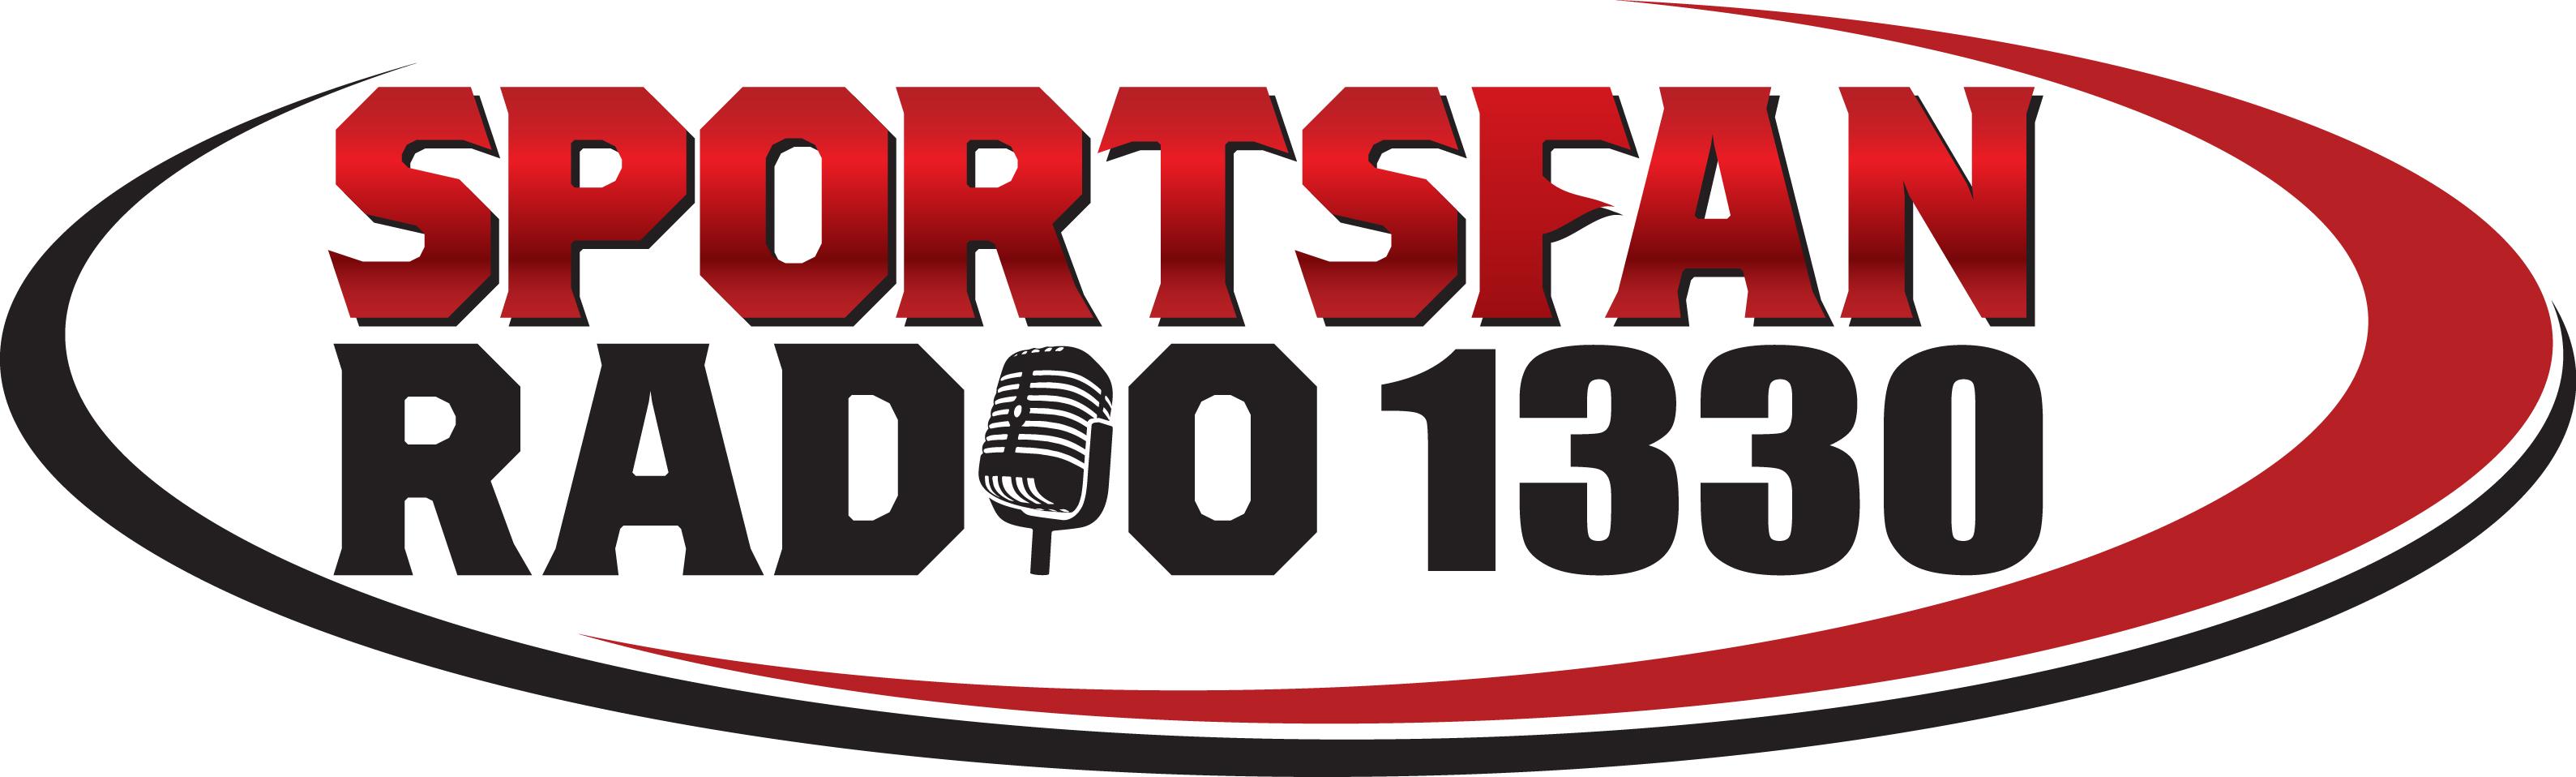 sportsfan-radio-1330